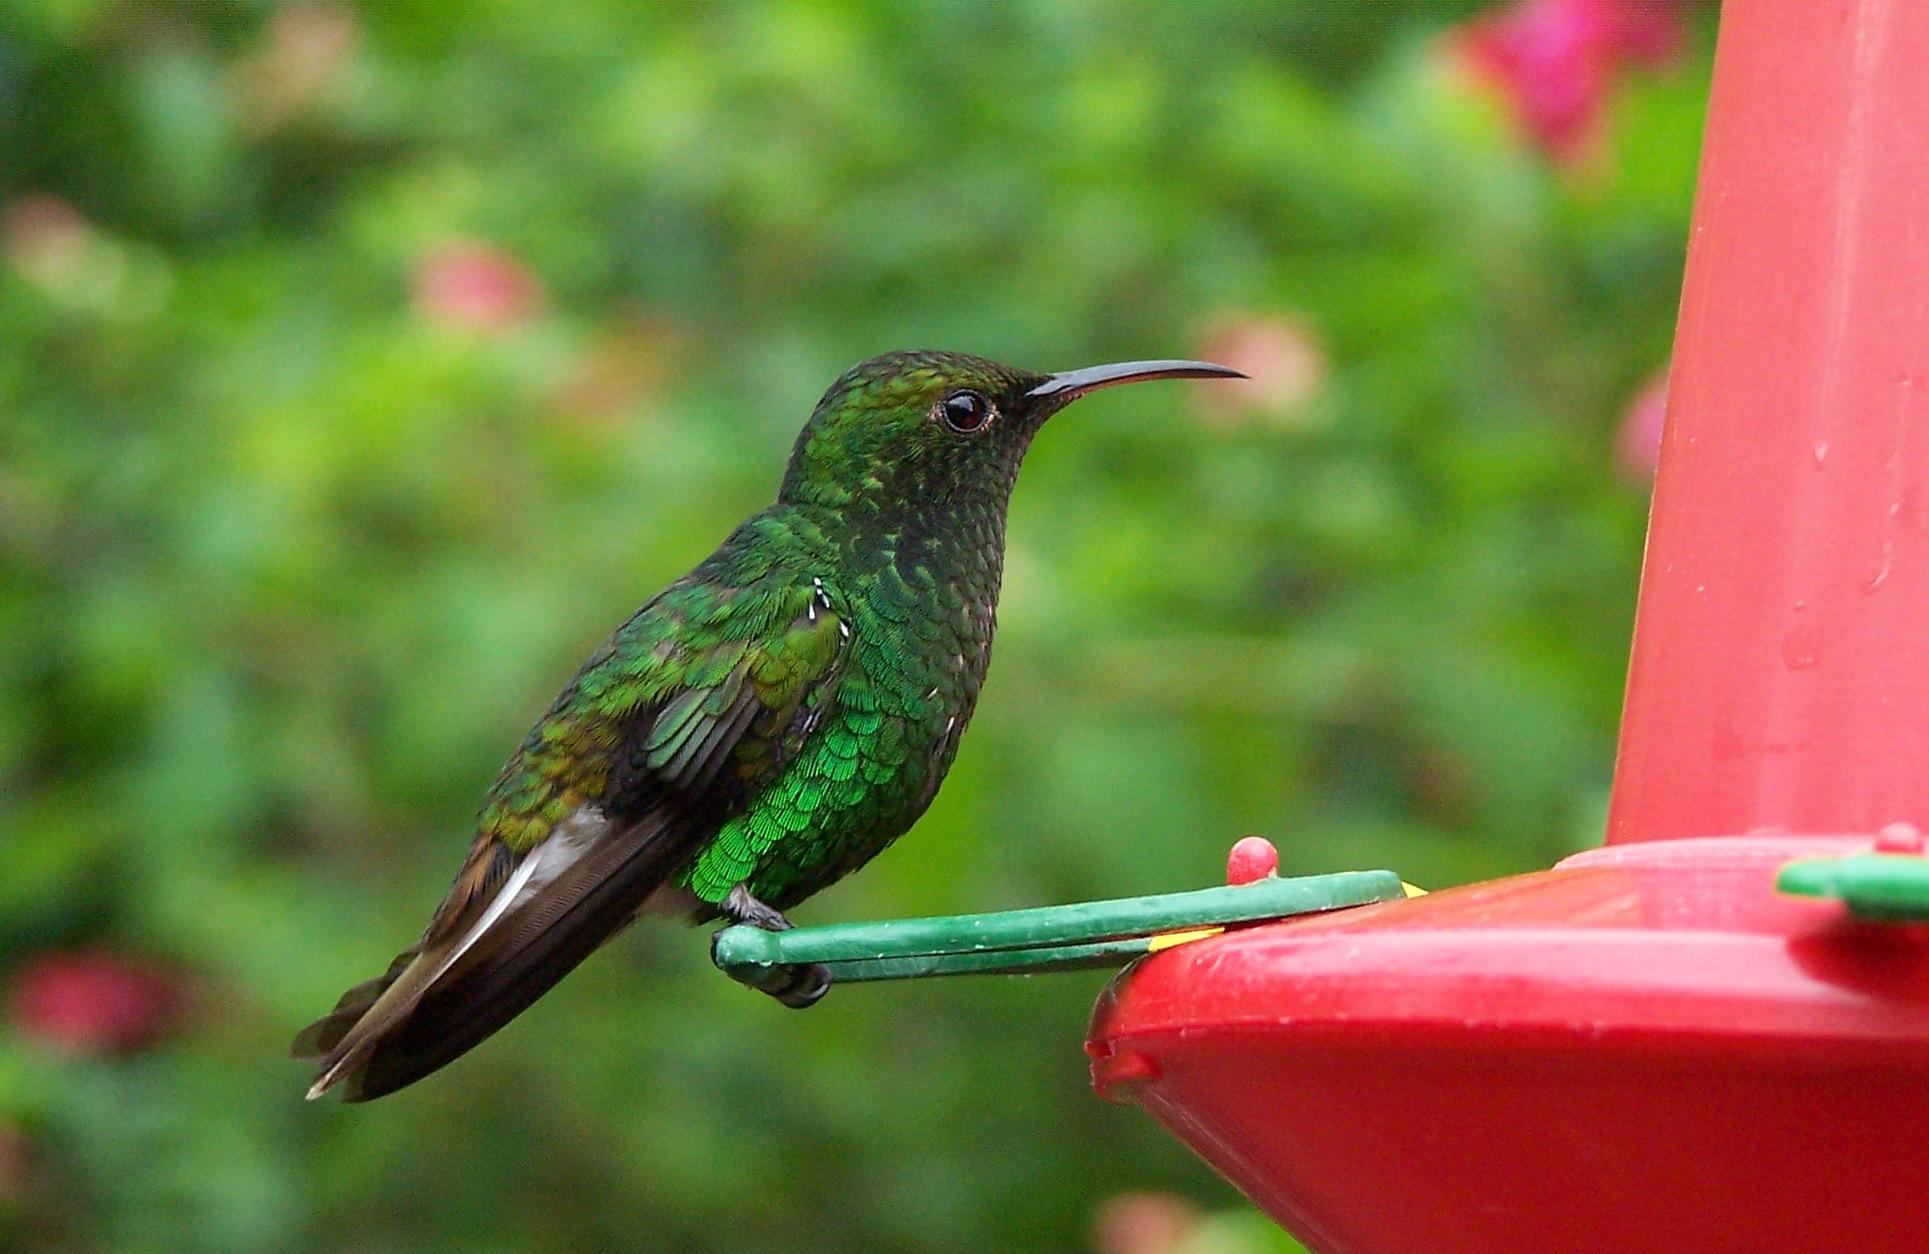 File:Costa-Rica-colibri-humming-bird.jpg - Wikipedia, the free ...